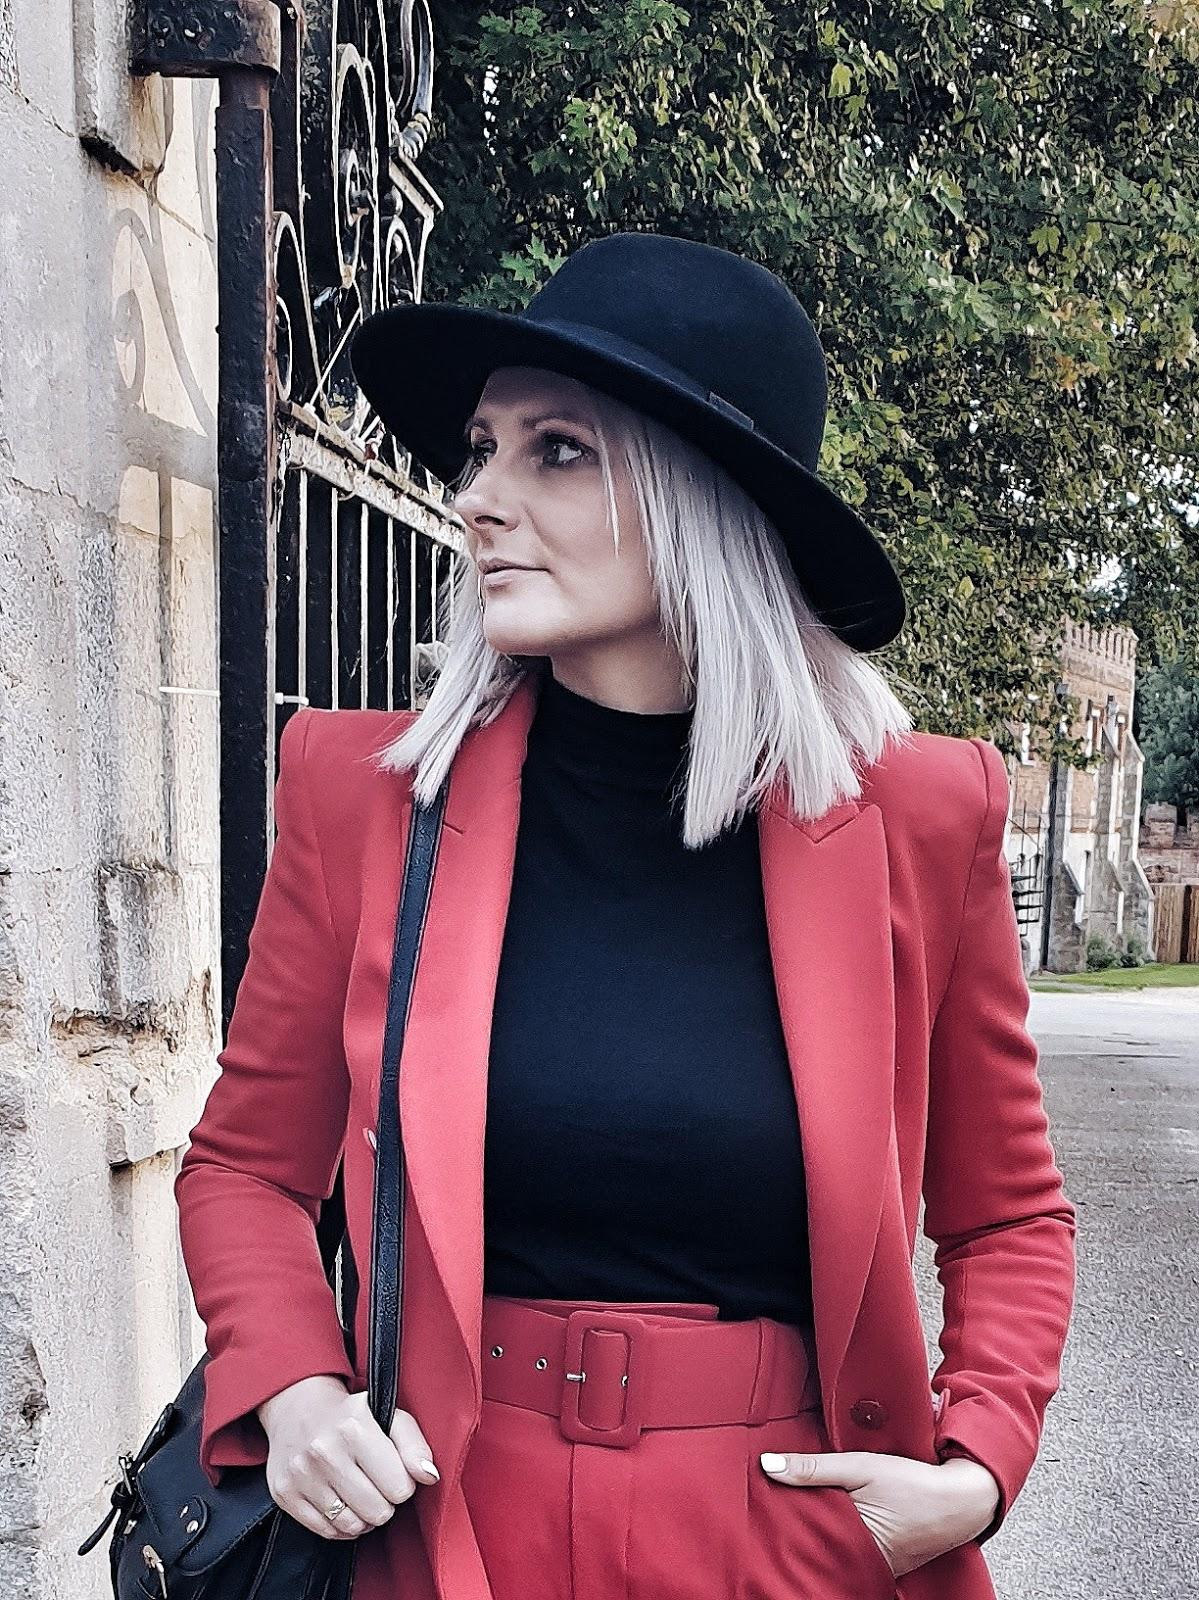 Red suit & biker boots czyli garnitur i trapery jako duet idealny